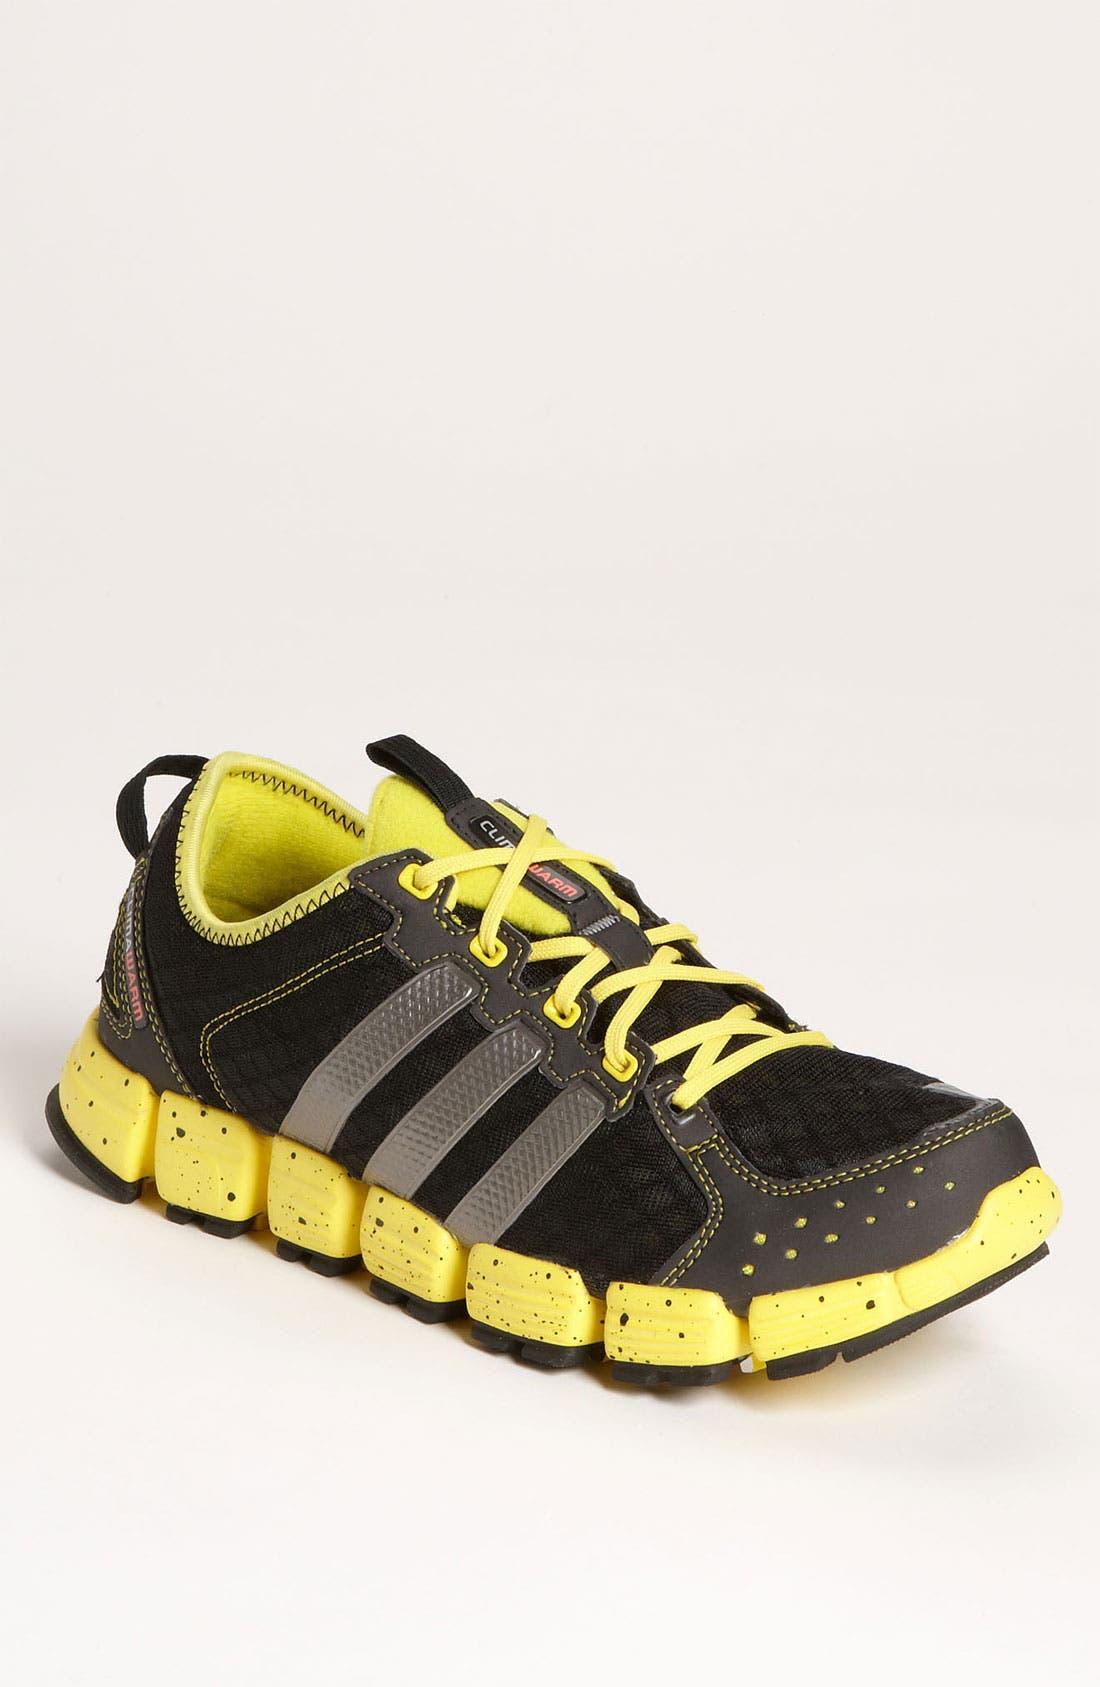 Alternate Image 1 Selected - adidas 'CLIMAWARM® Blast' Running Shoe (Men) (Online Only)